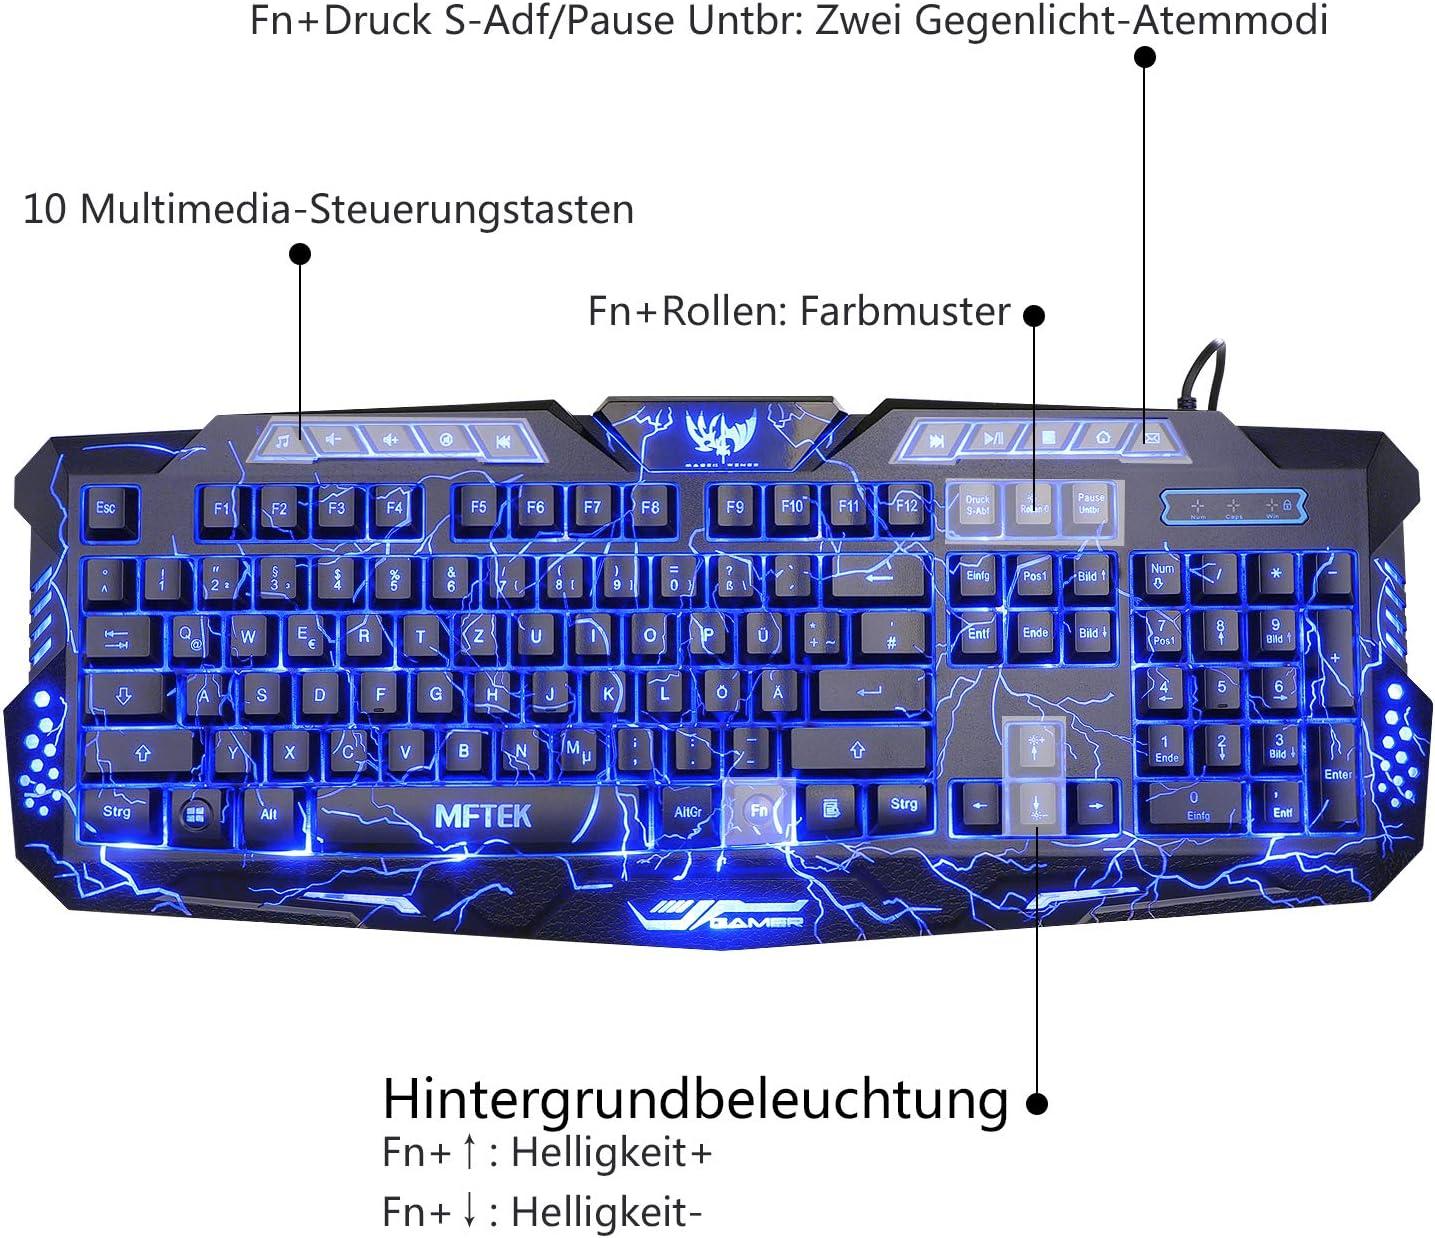 mftek USB Crack Azul LED Backlit Luminous illuminated Gaming Teclado y Ratón Set para Laptop Desktop Gamers with mouse pad (13 inch * 9 inch) negro ...